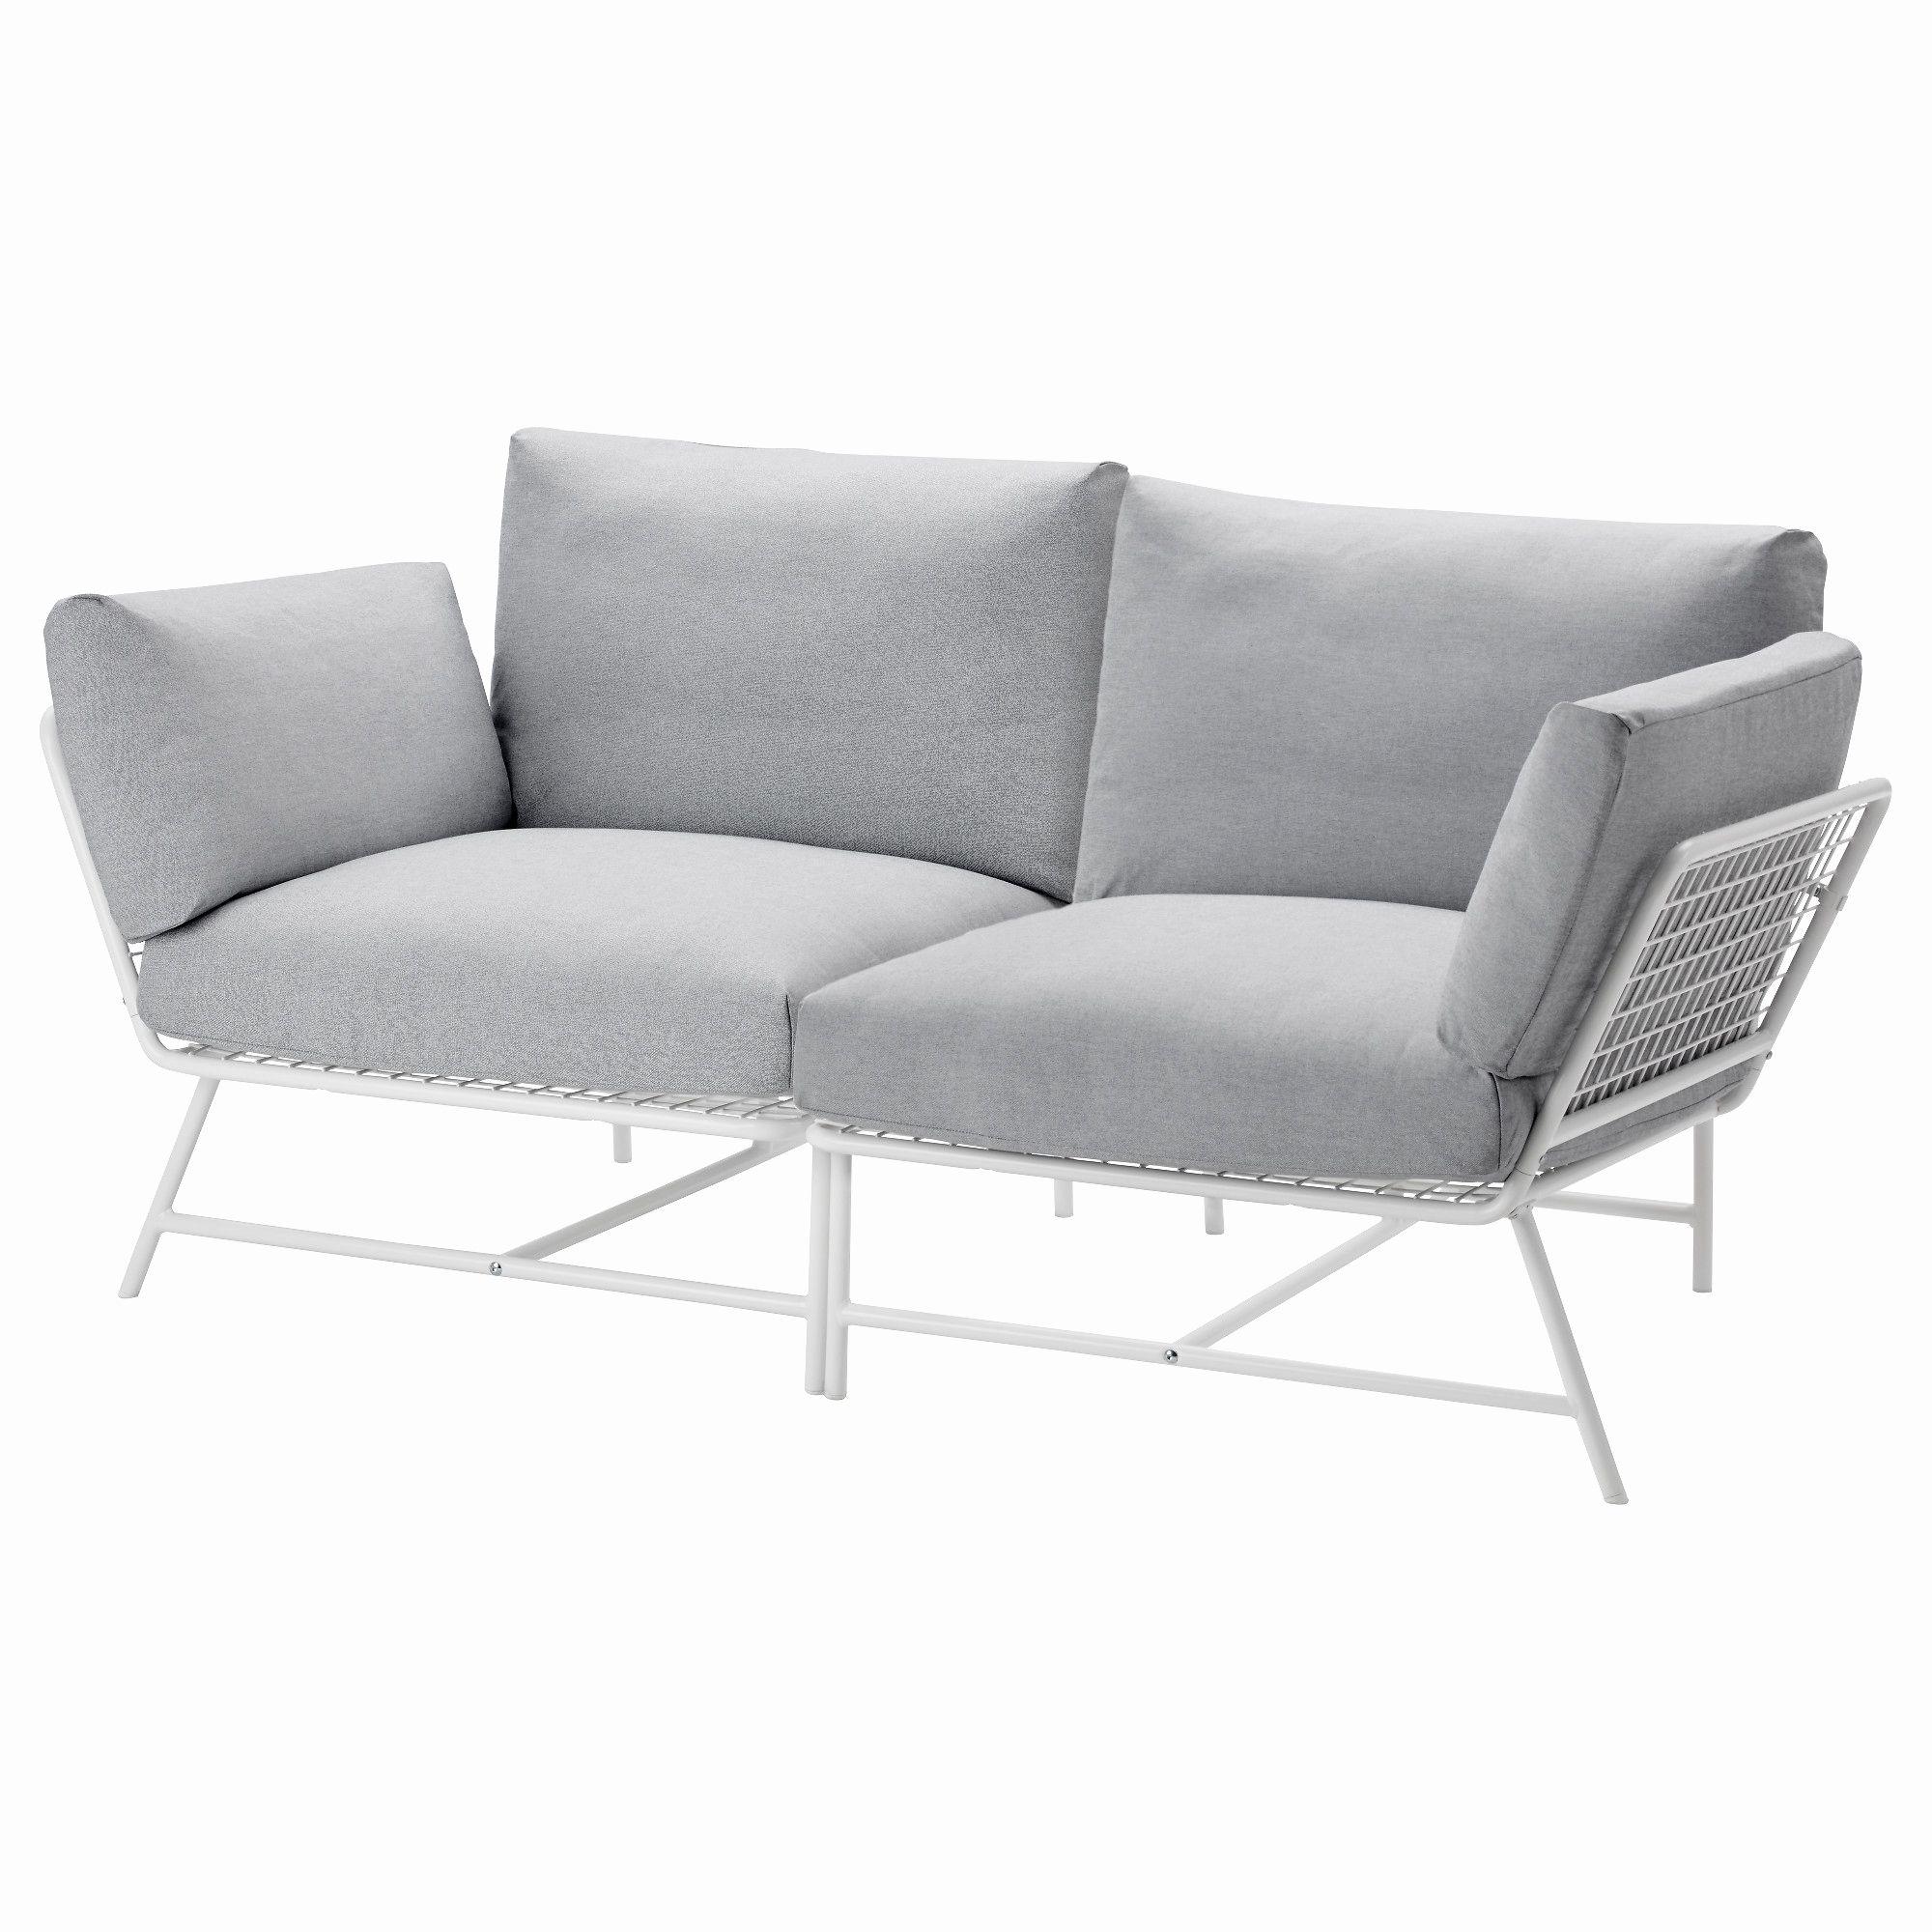 Good Mini Sofa For Bedroom Picture Mini Sofa For Bedroom Awesome Sofa Dazzling Sofa Chair Ikea Mini Couches Bed For Be Affordable Sofa Apartment Sofa Mini Sofa